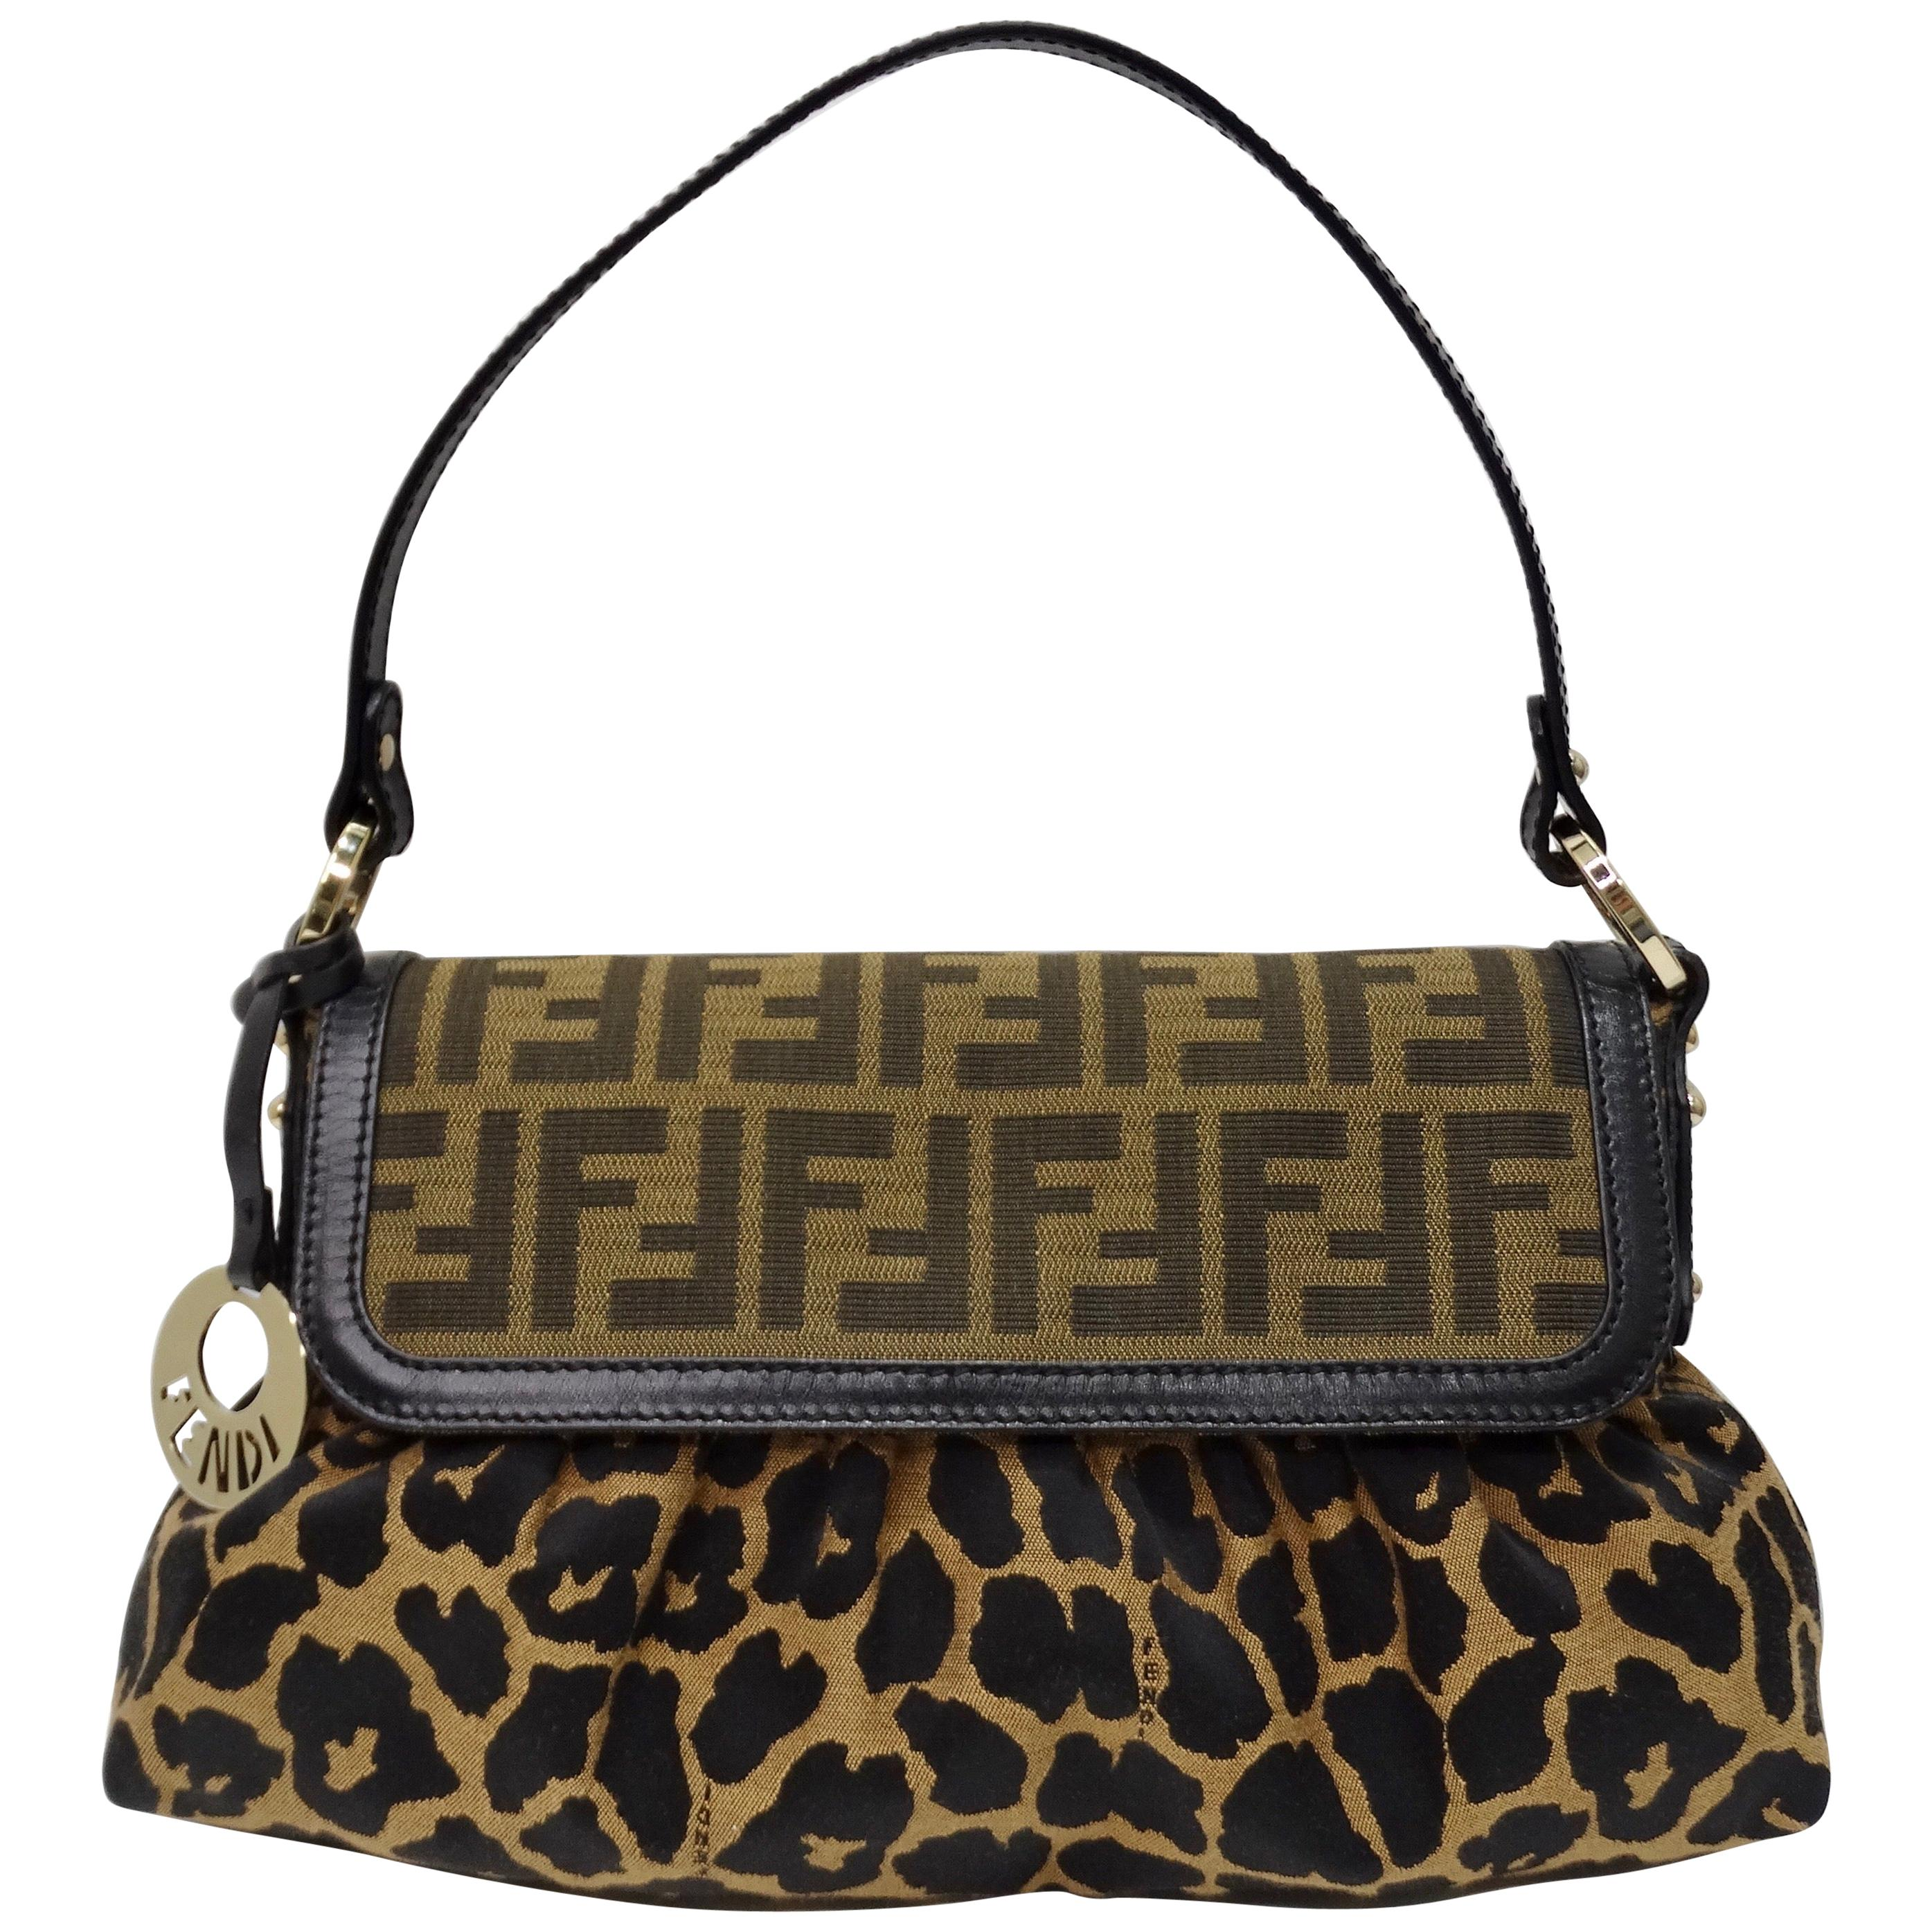 Fendi 2000s Leopard Print Zucca Handbag